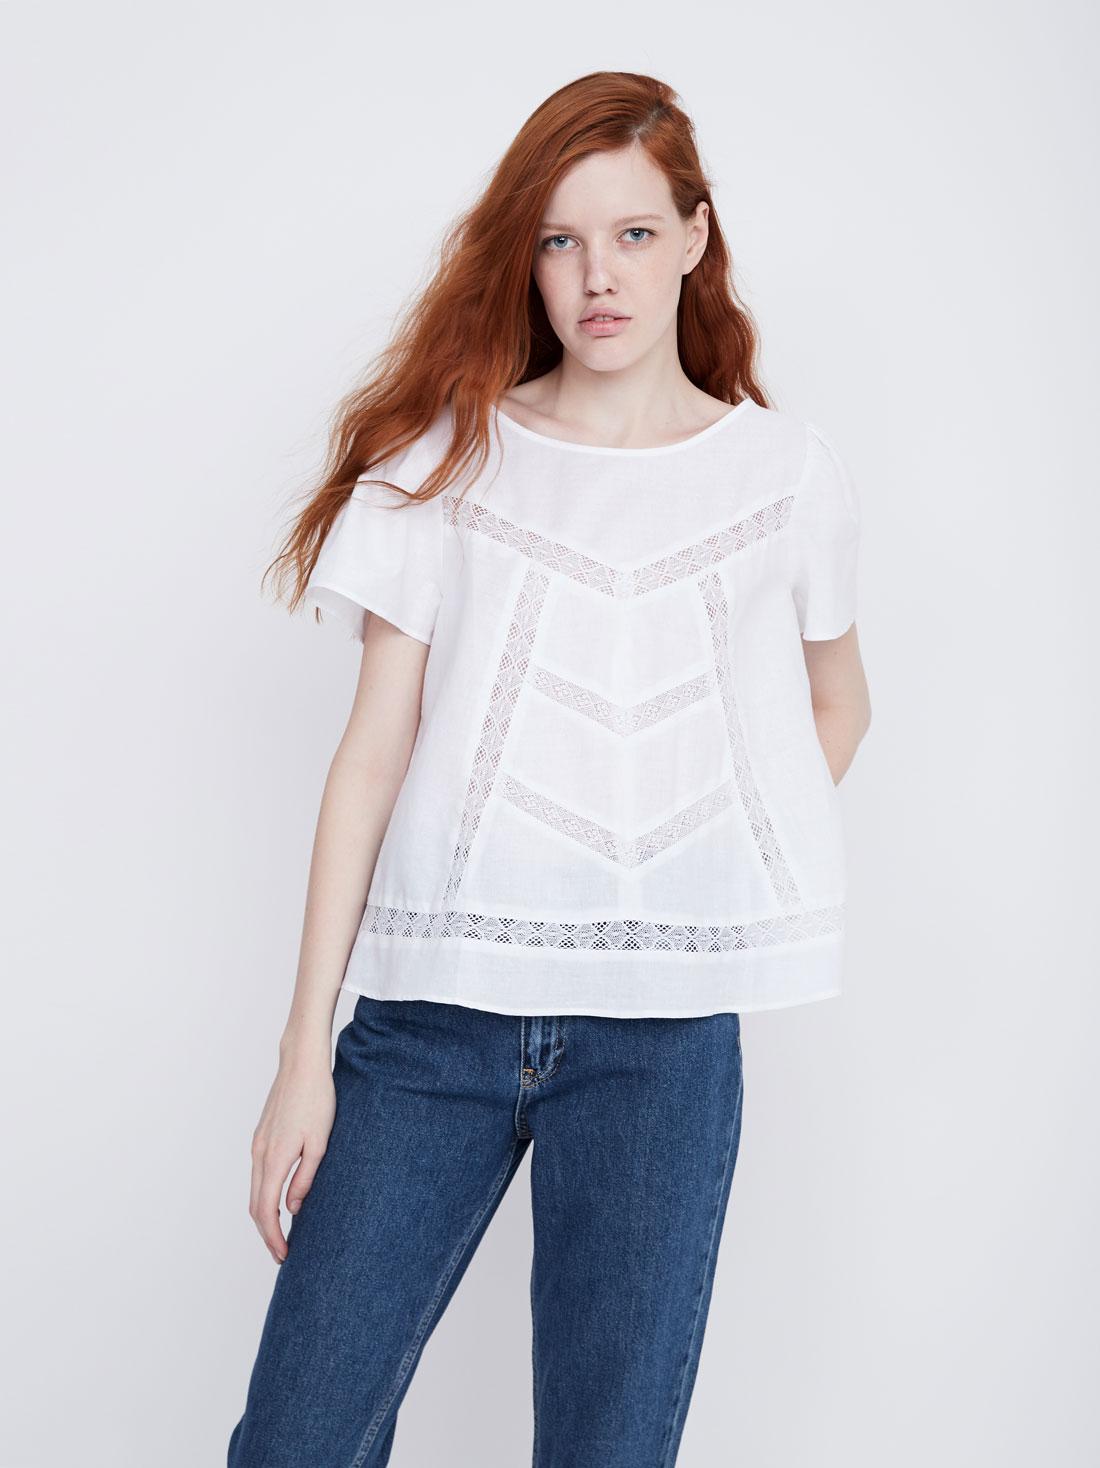 2b77840d26f Блузка с кружевными вставками белый цвет - Рубашки и блузки LIME